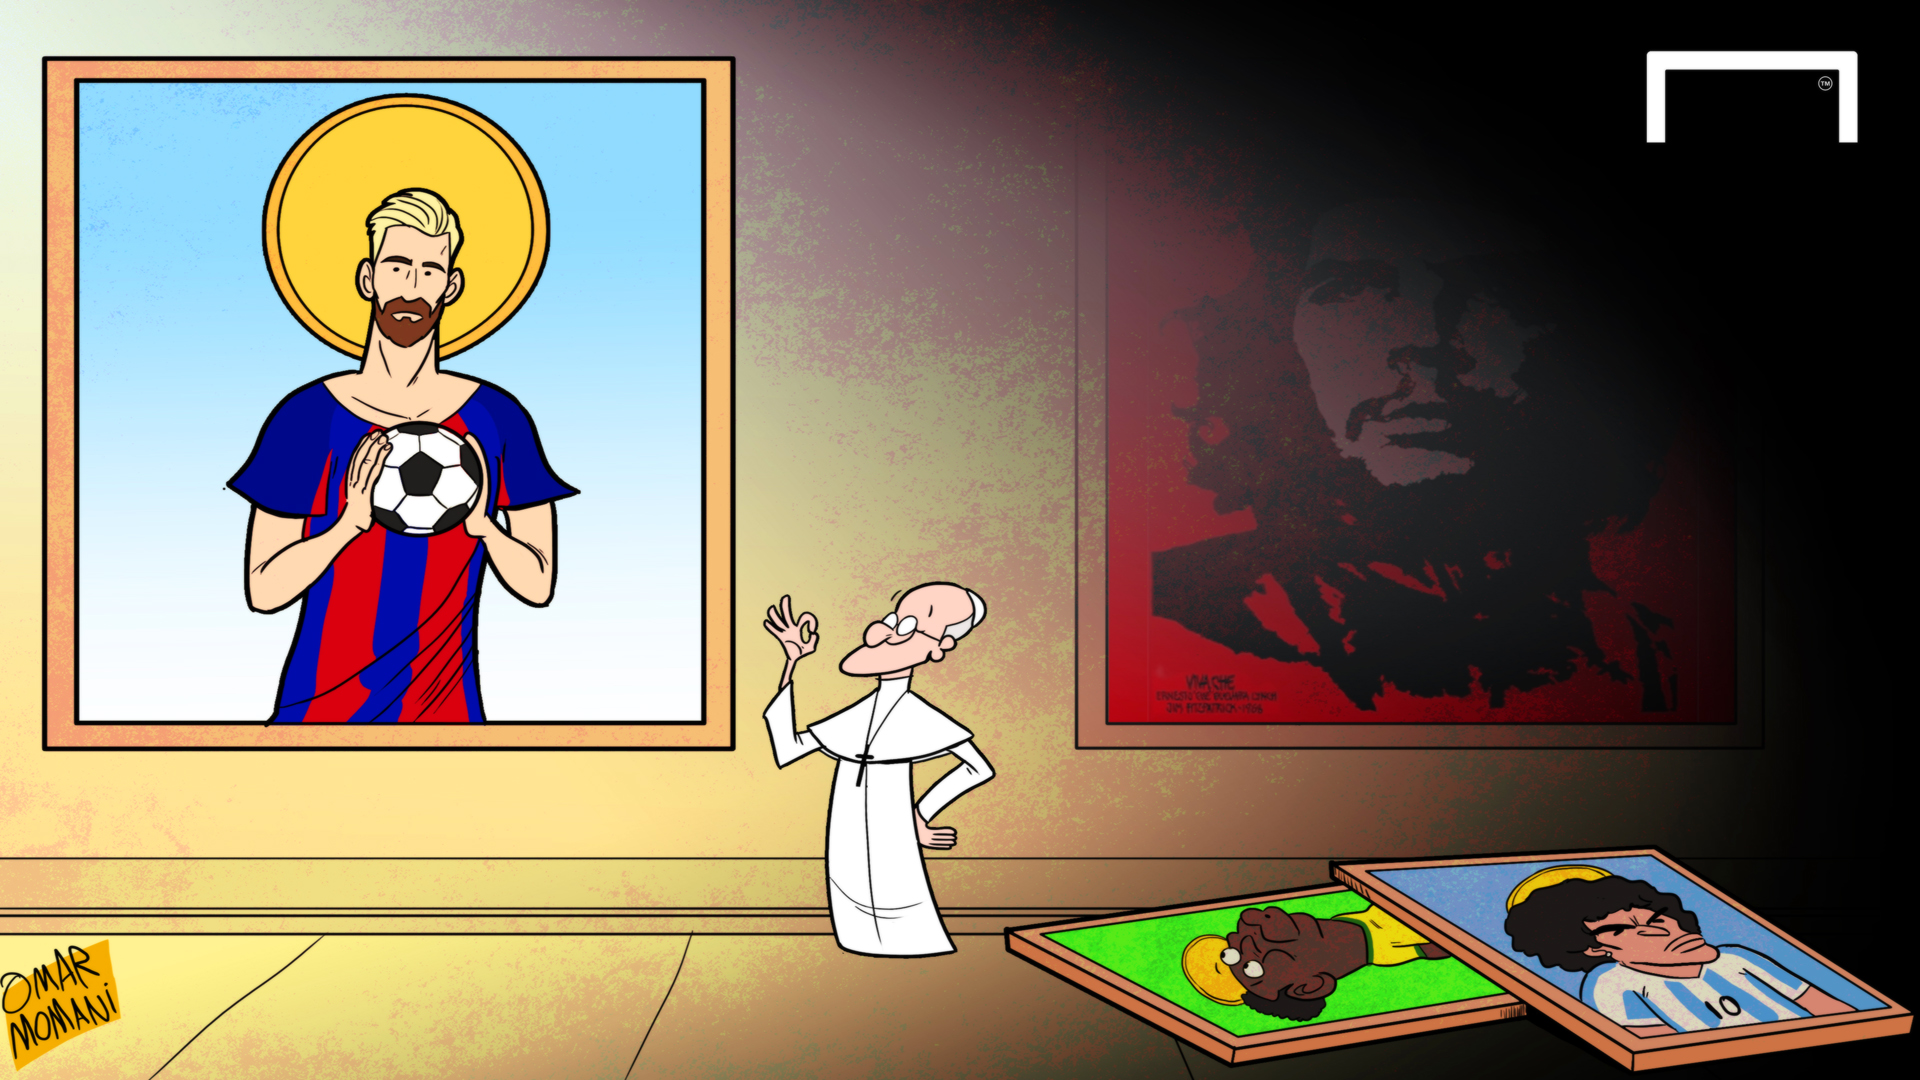 Cartoon Pope Messi is better than Pele and Maradona